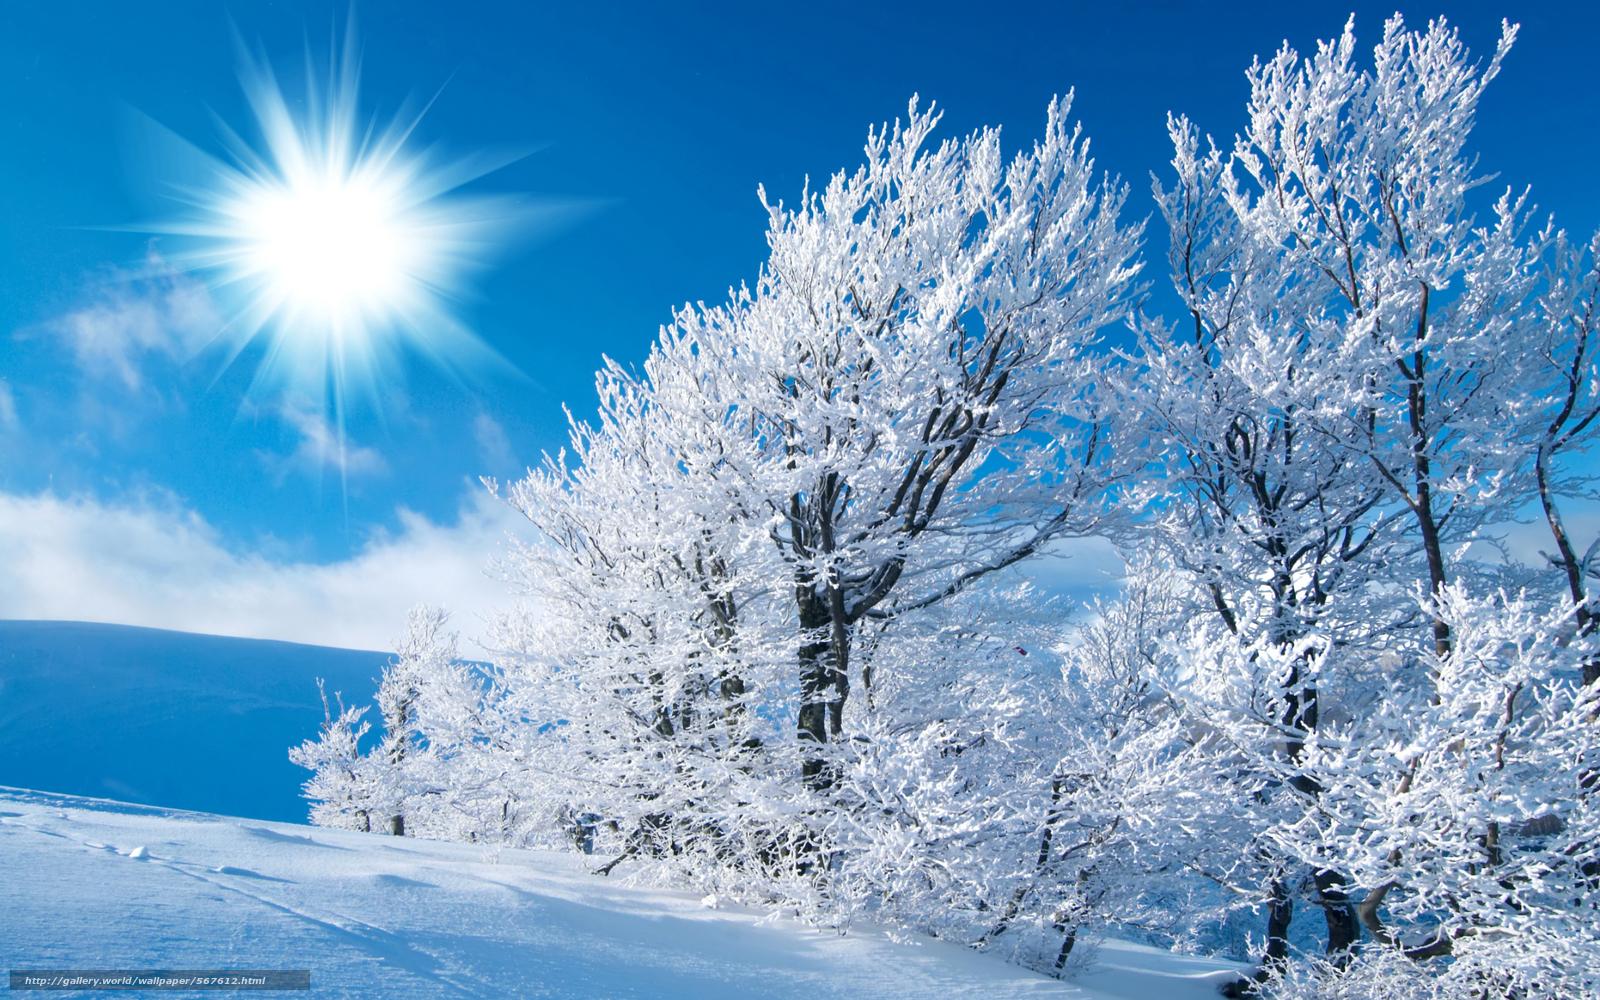 Winter nature wallpaper desktop